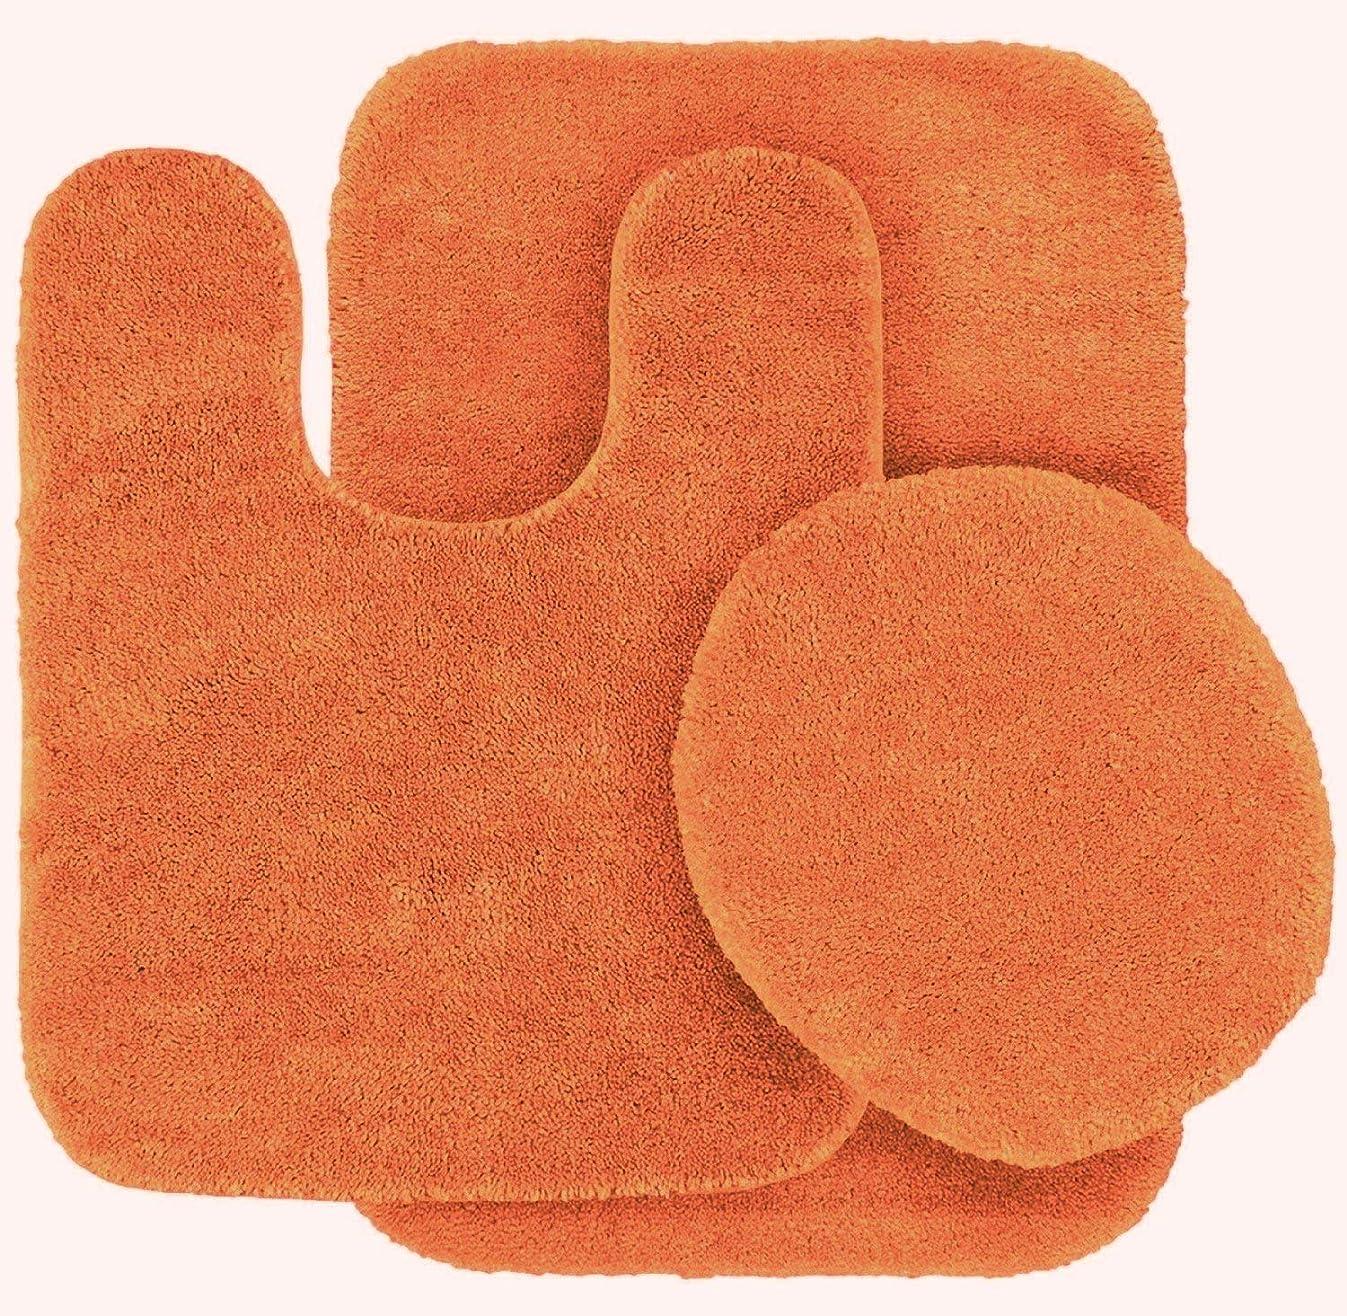 Fancy Linen 3pc Non-Slip Bath Mat Set Solid Orange Bathroom U-Shaped Contour Rug, Mat and Toilet Lid Cover New #Angela